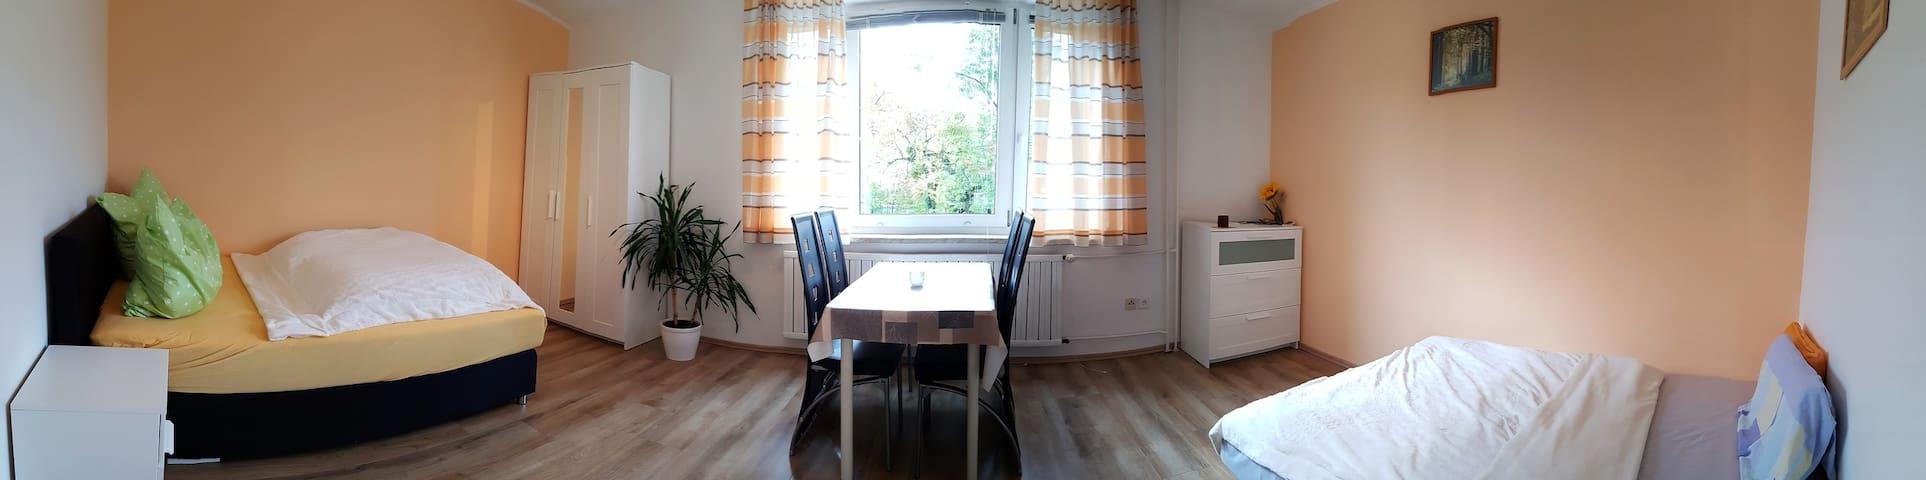 1-Raum-Appartment nahe Hochschule Coburg